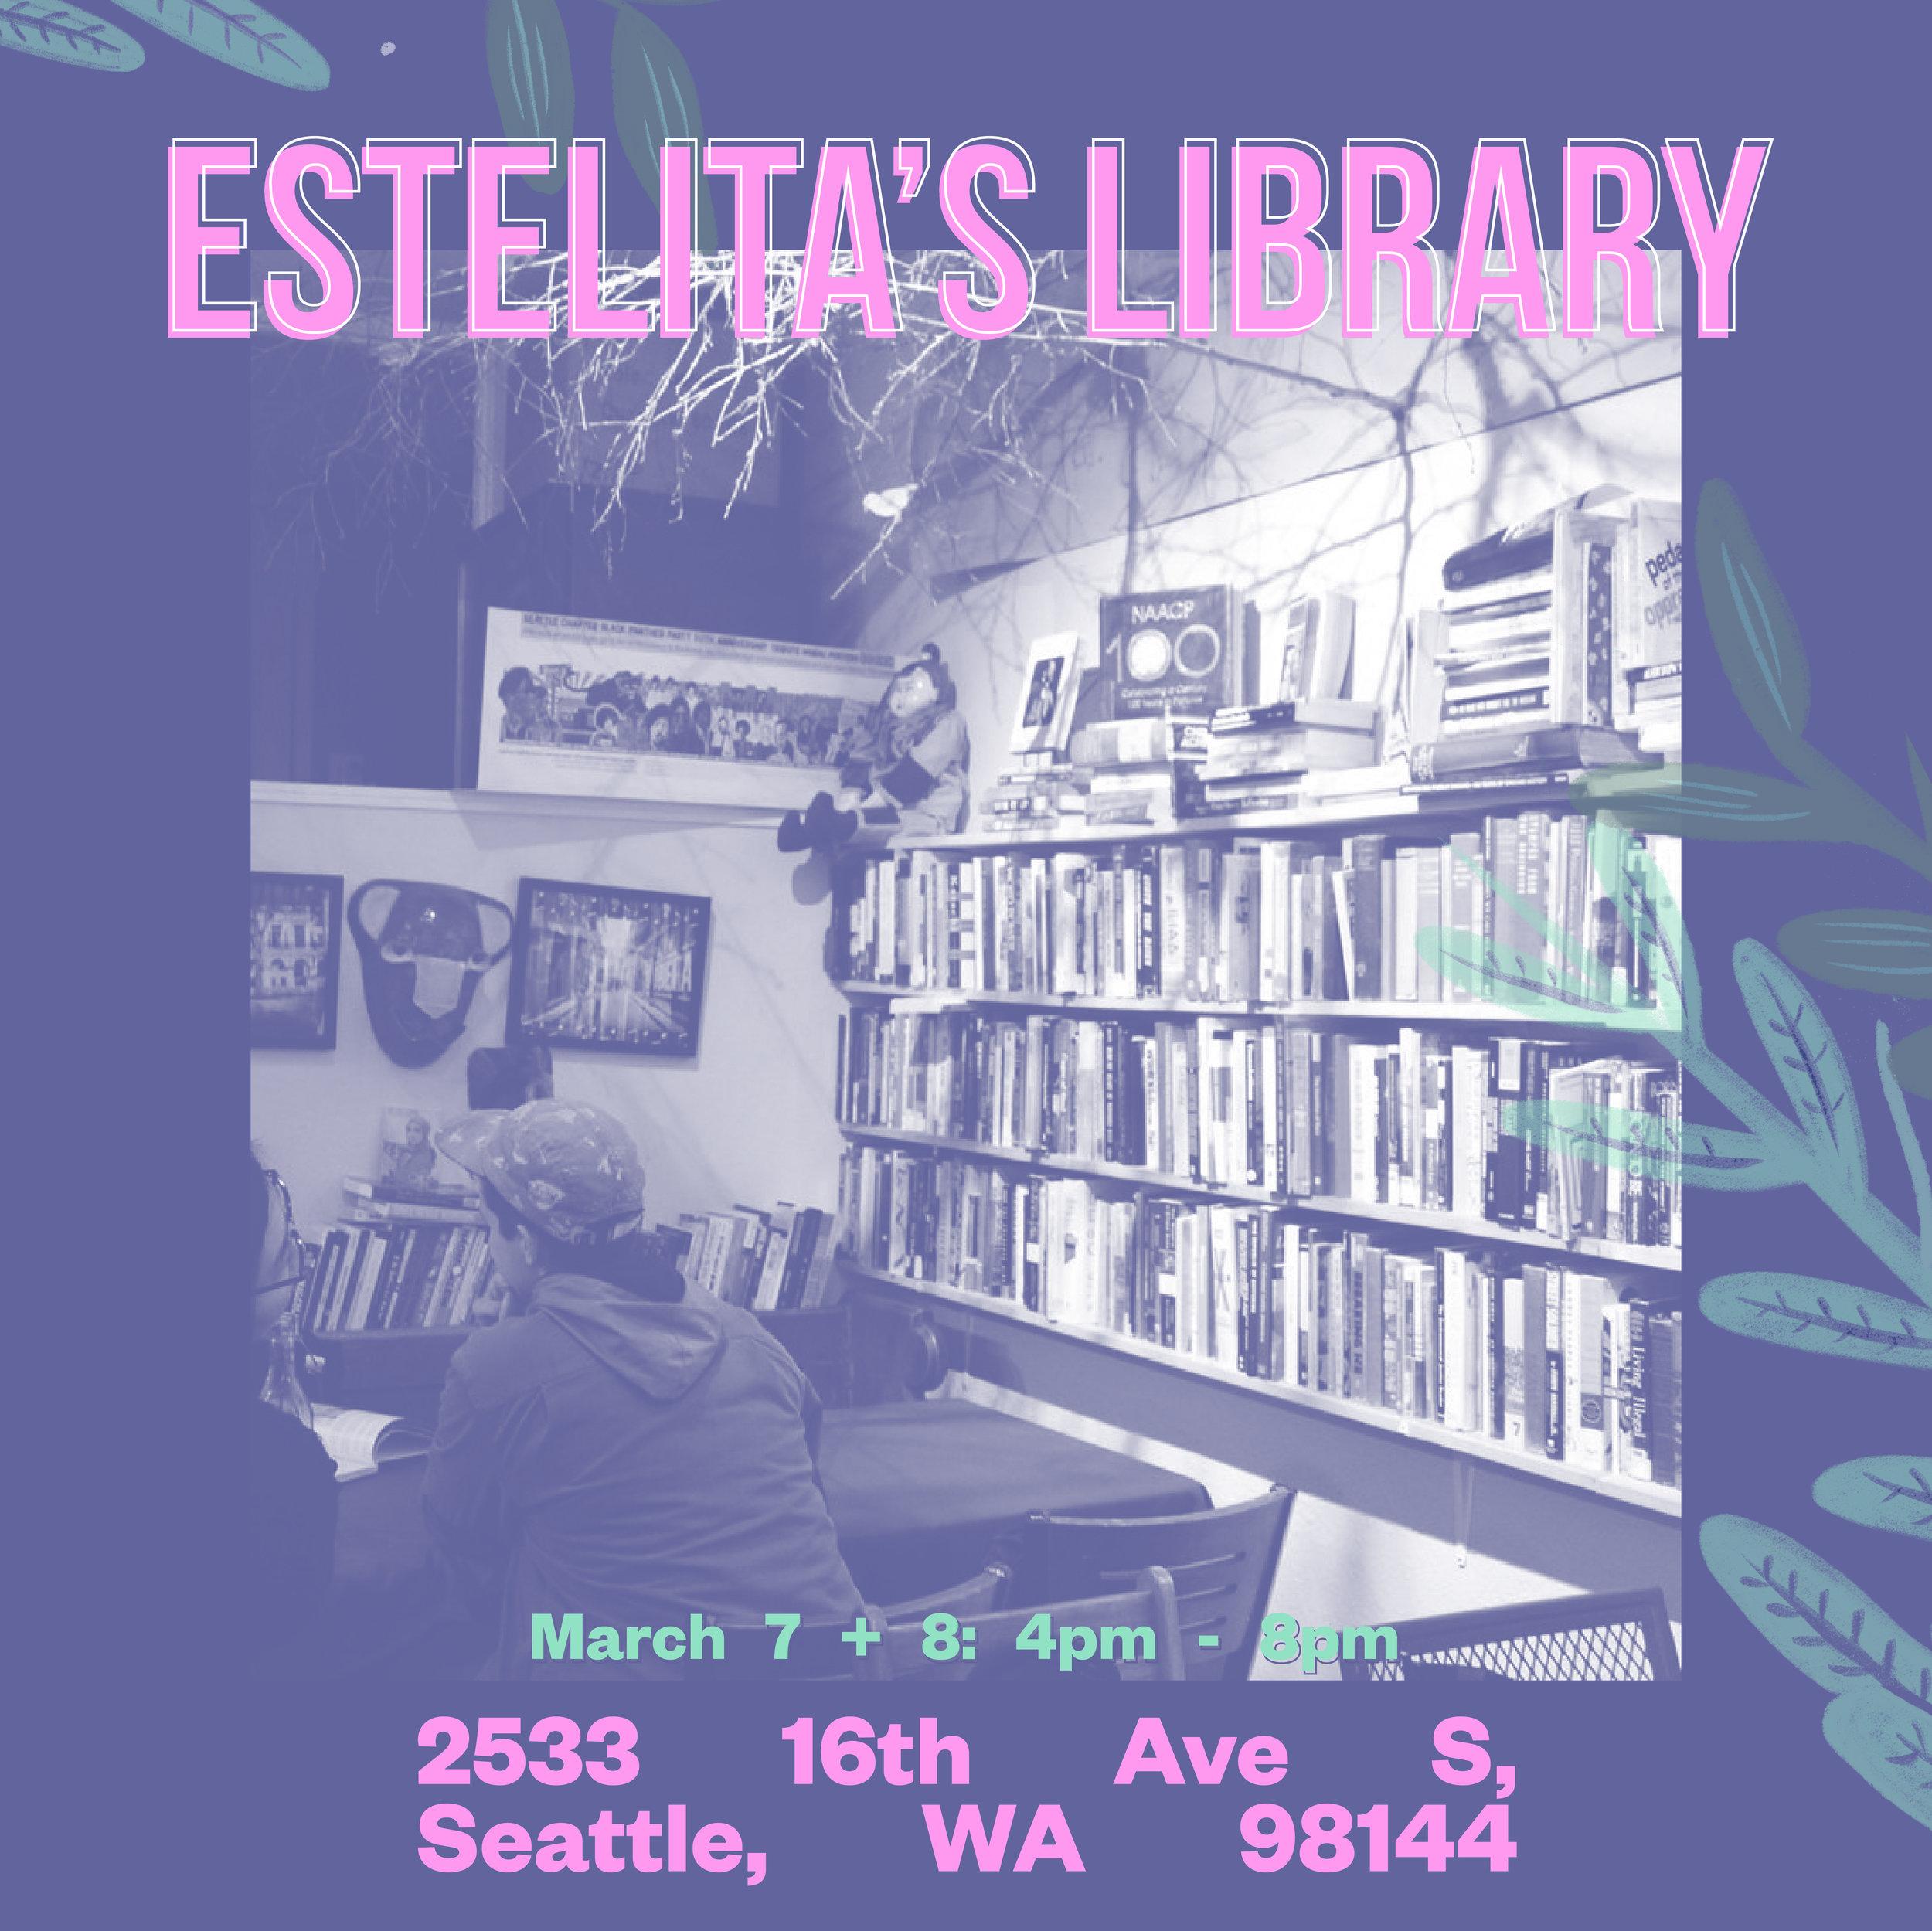 Seattle_Estelita_s_FINAL (1).jpg